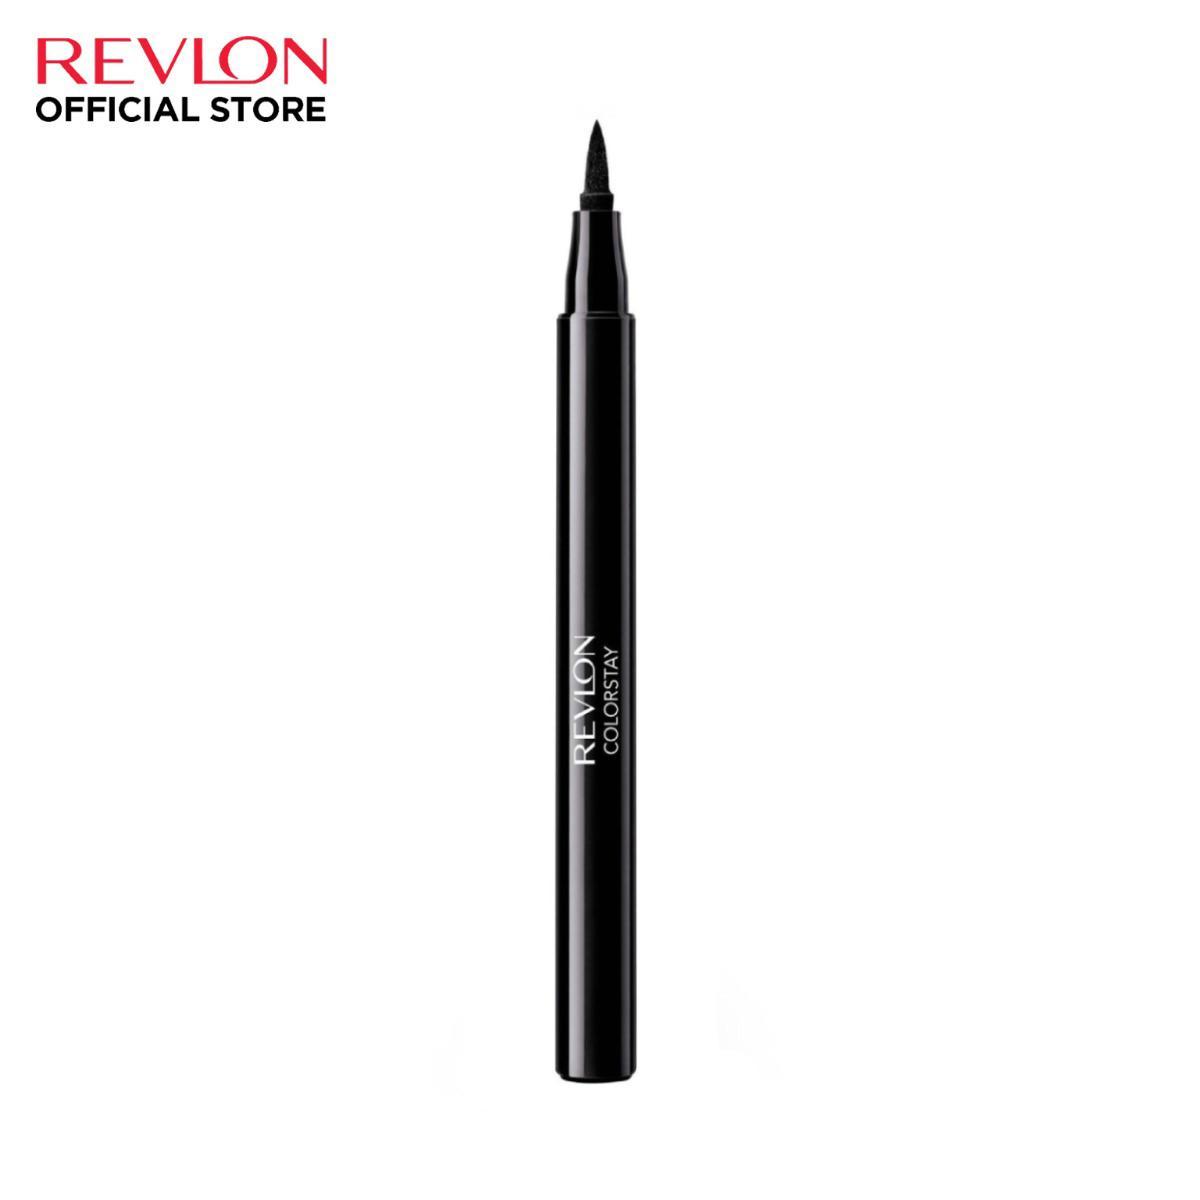 Revlon Colorstay Liquid Eye Pens.